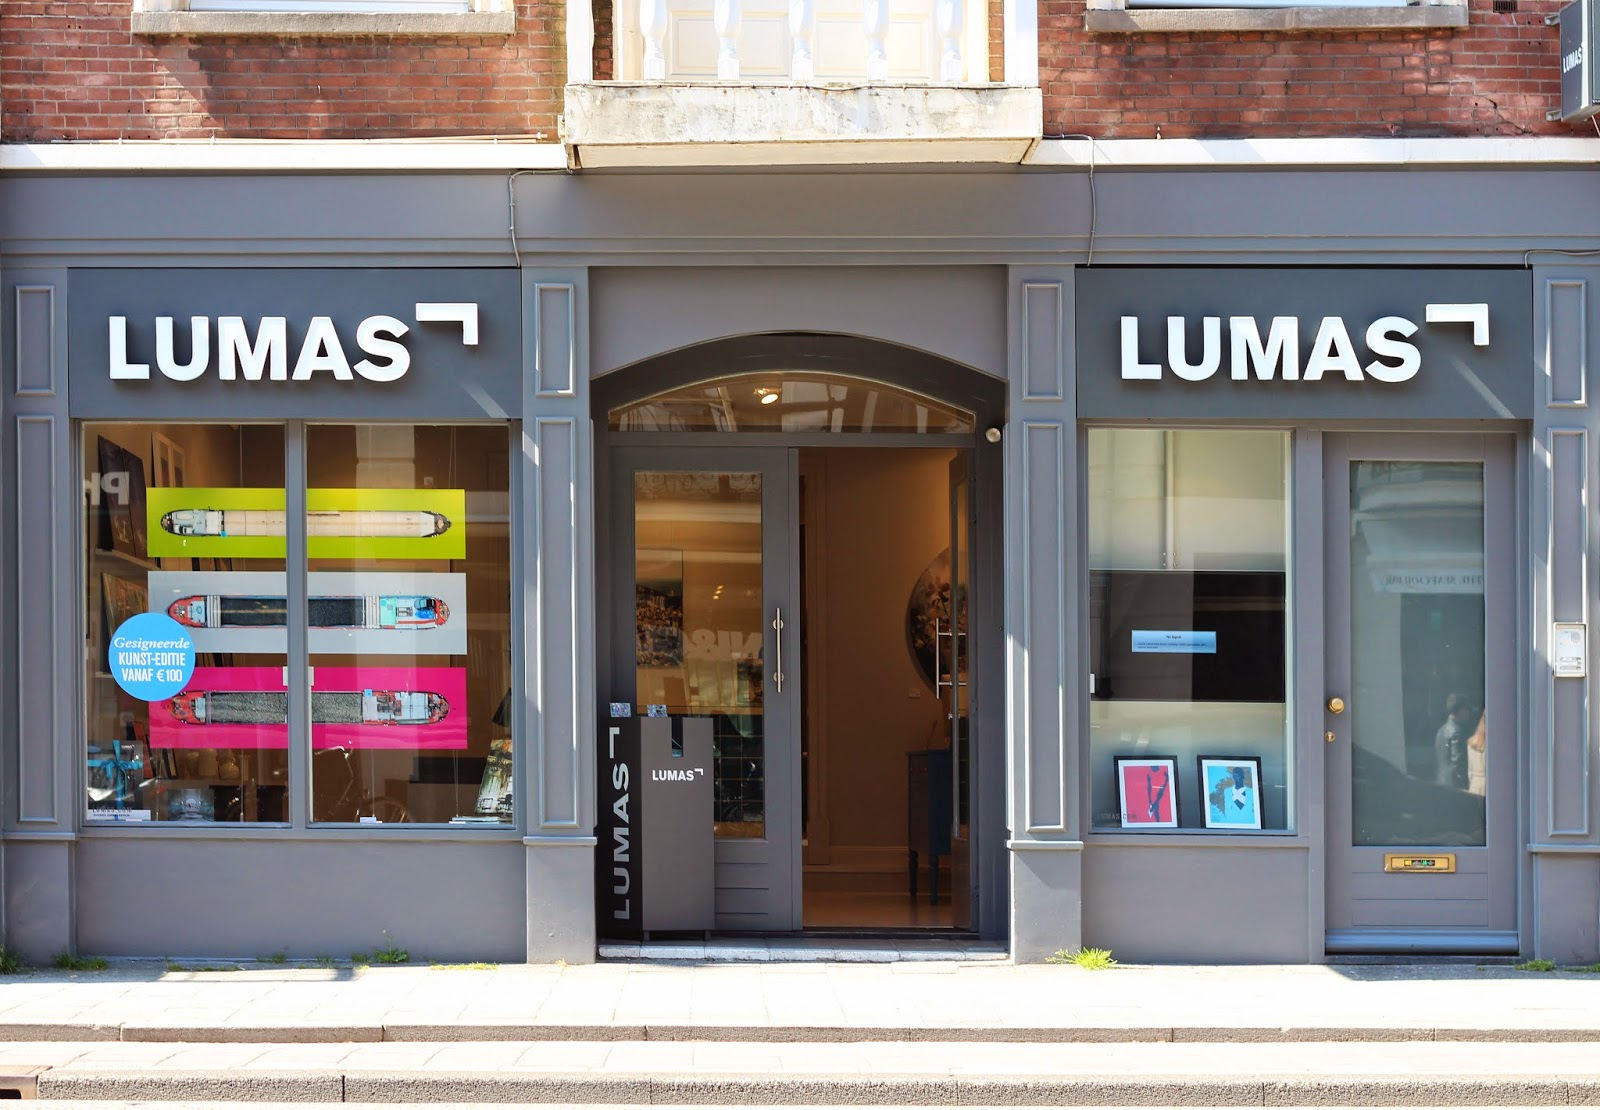 lumas gallery amsterdam art hotspot